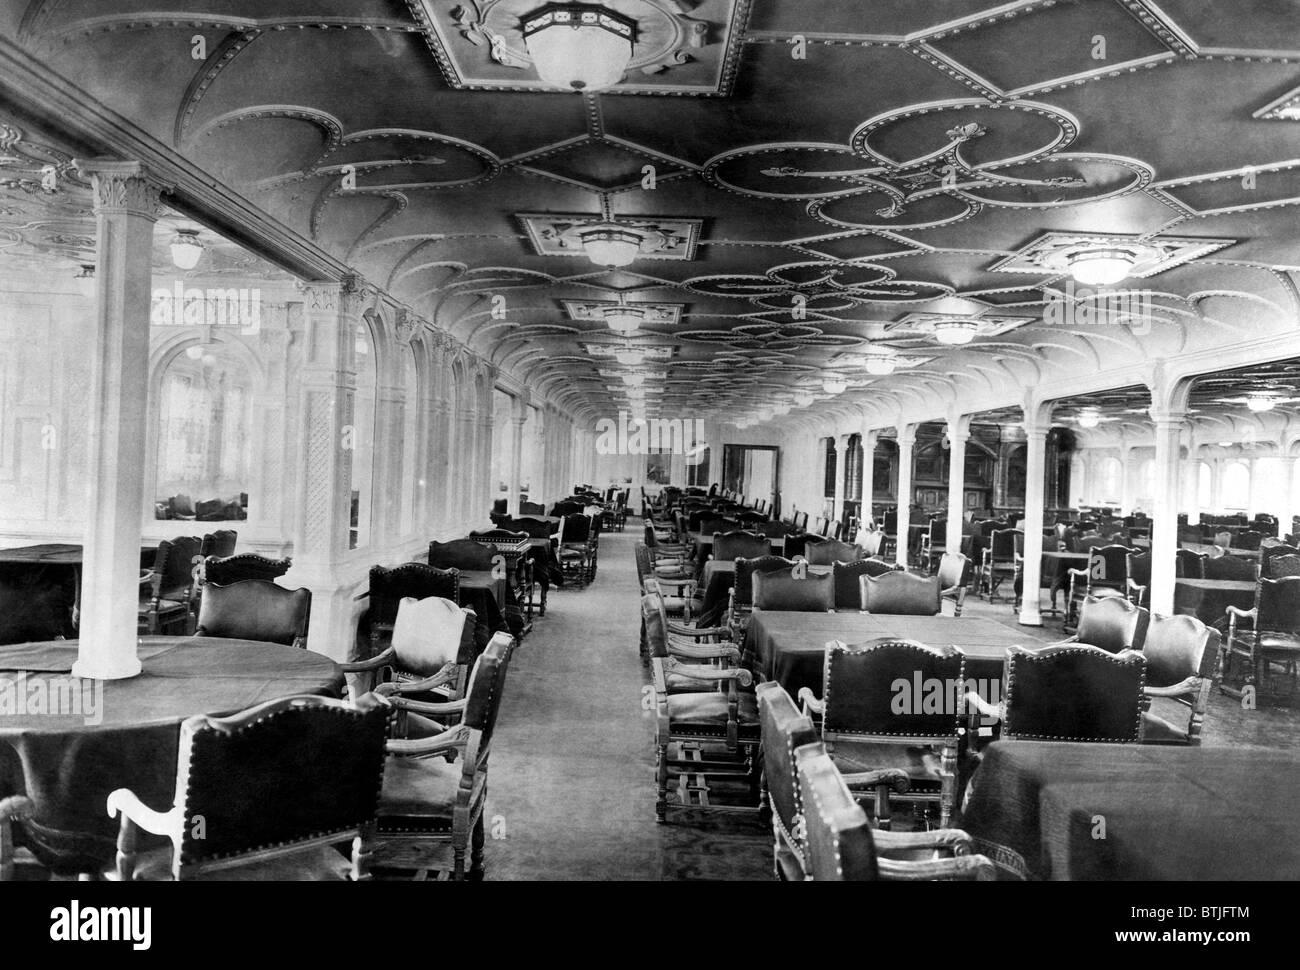 the titanic dining room stock photos & the titanic dining room